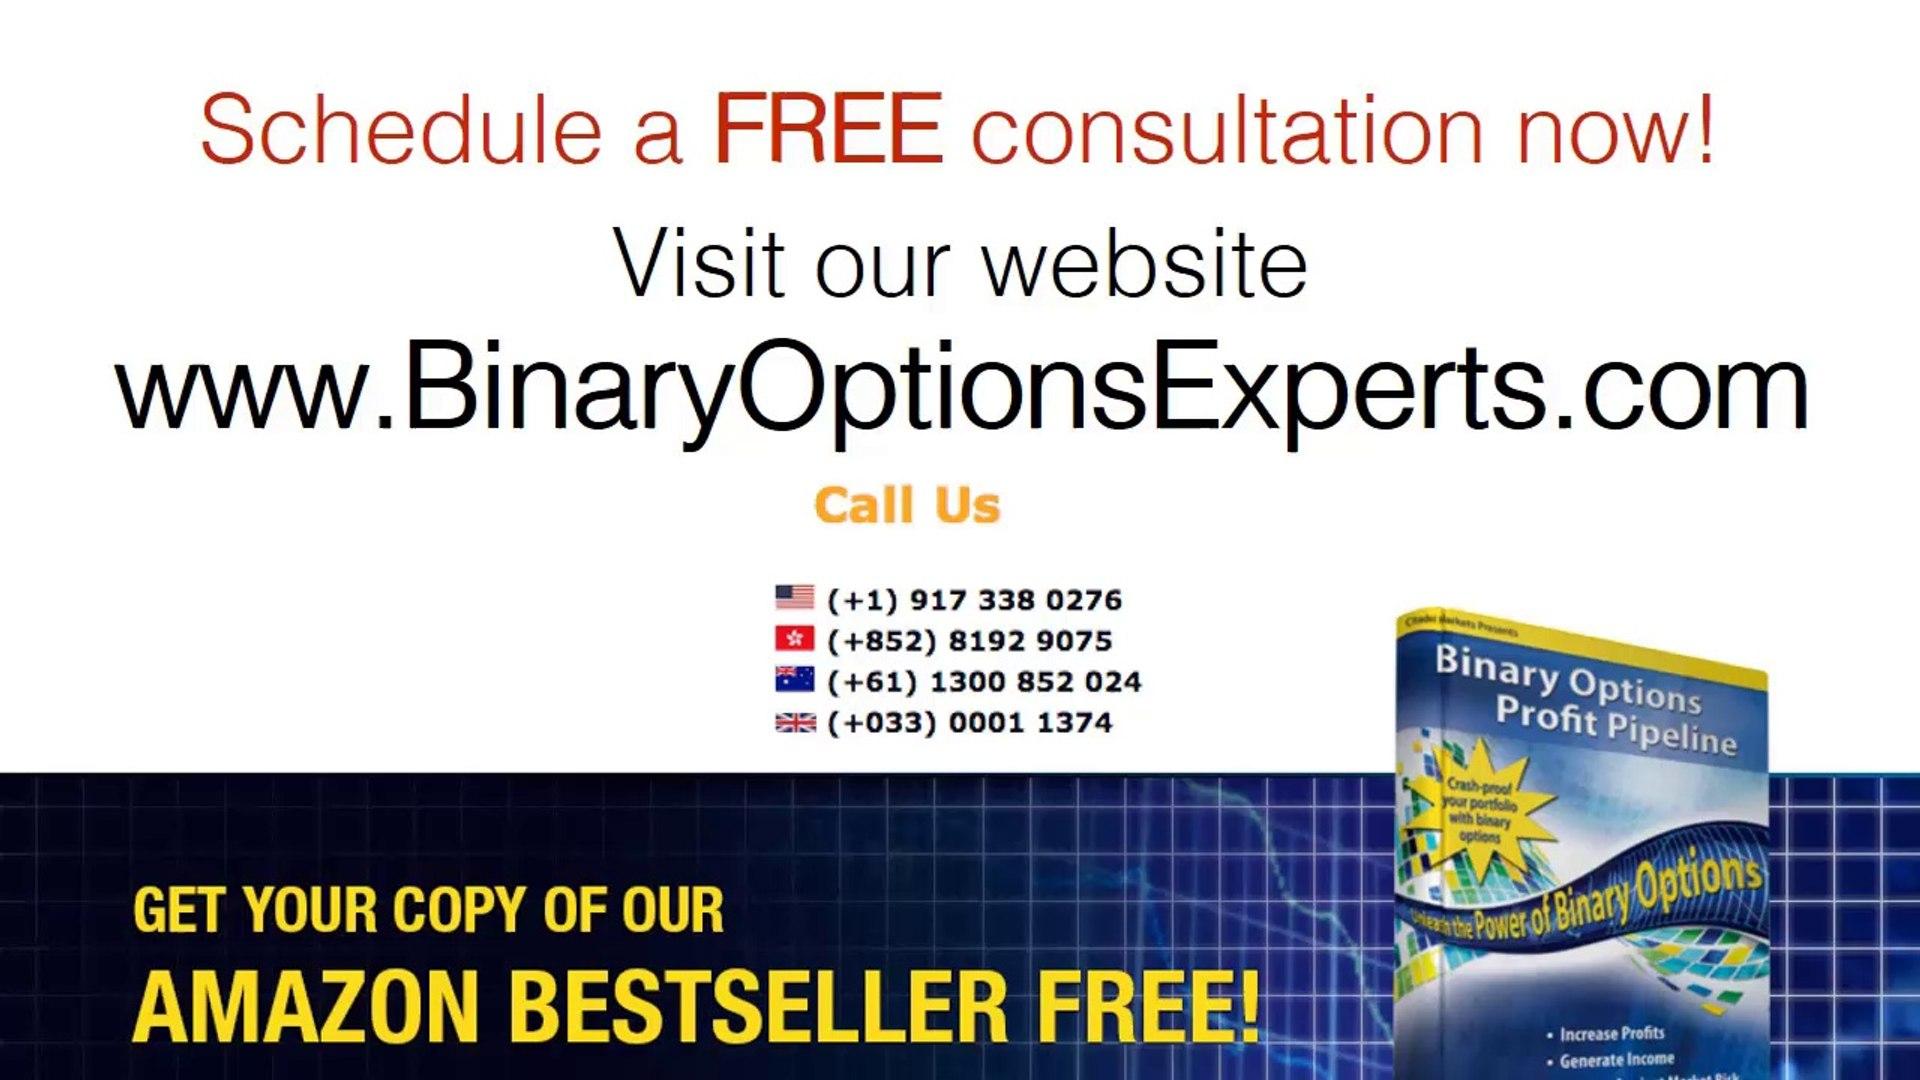 Binary options profit pipeline live sports betting sites